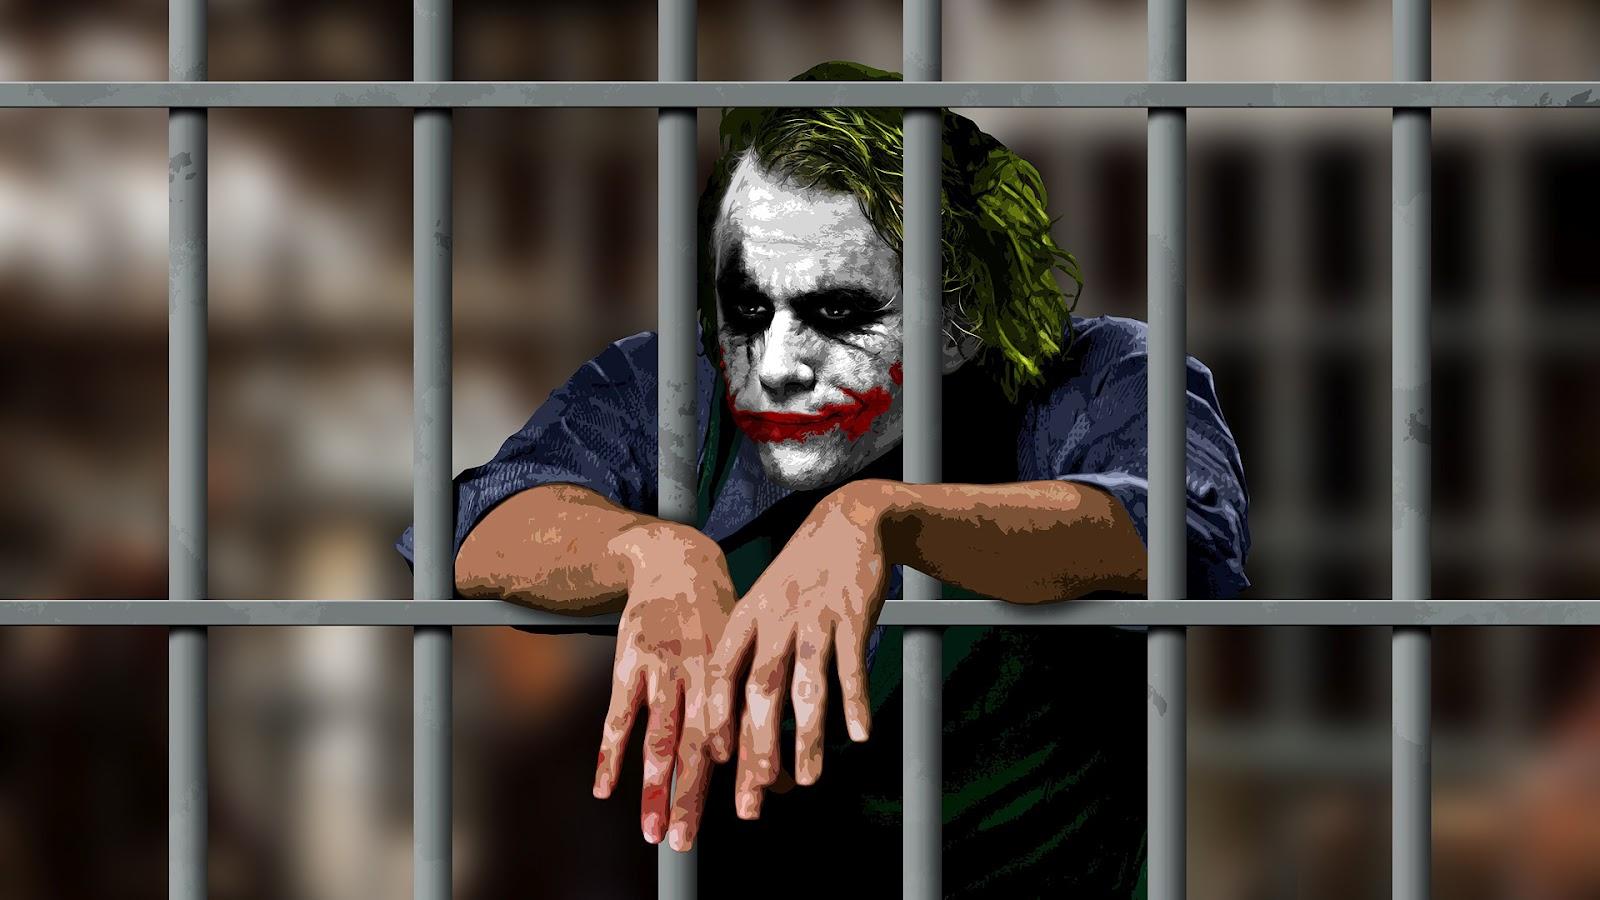 http://3.bp.blogspot.com/-uw7y5RVr3Eg/UBbSENfOhhI/AAAAAAAAEDg/RON8JvLY_pU/s1600/The-Dark-Knight-Wallpaper-Batman-Wallpaper-6.jpg